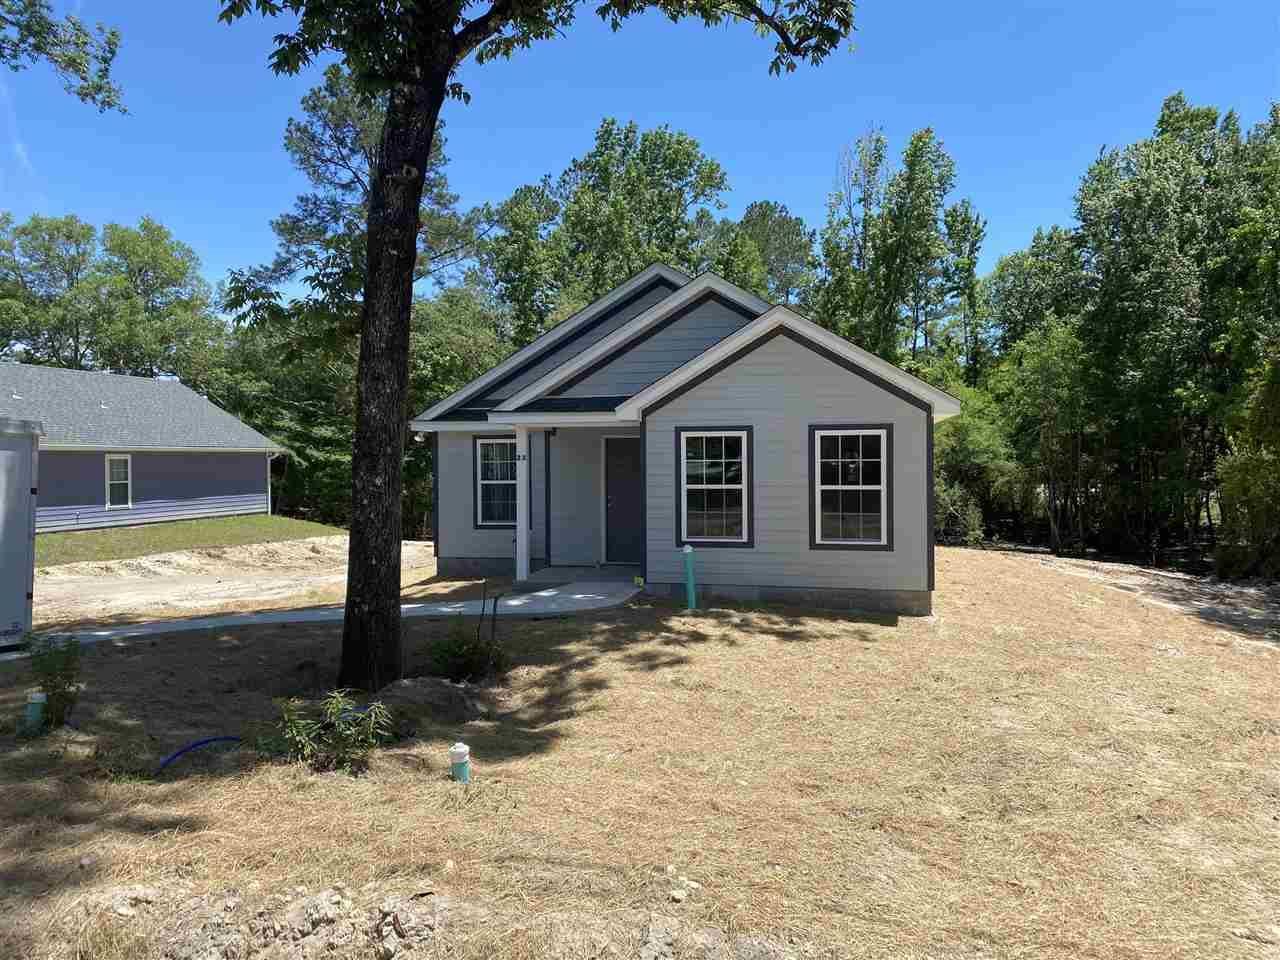 23 King Bee, Crawfordville, FL 32327 - MLS#: 327826